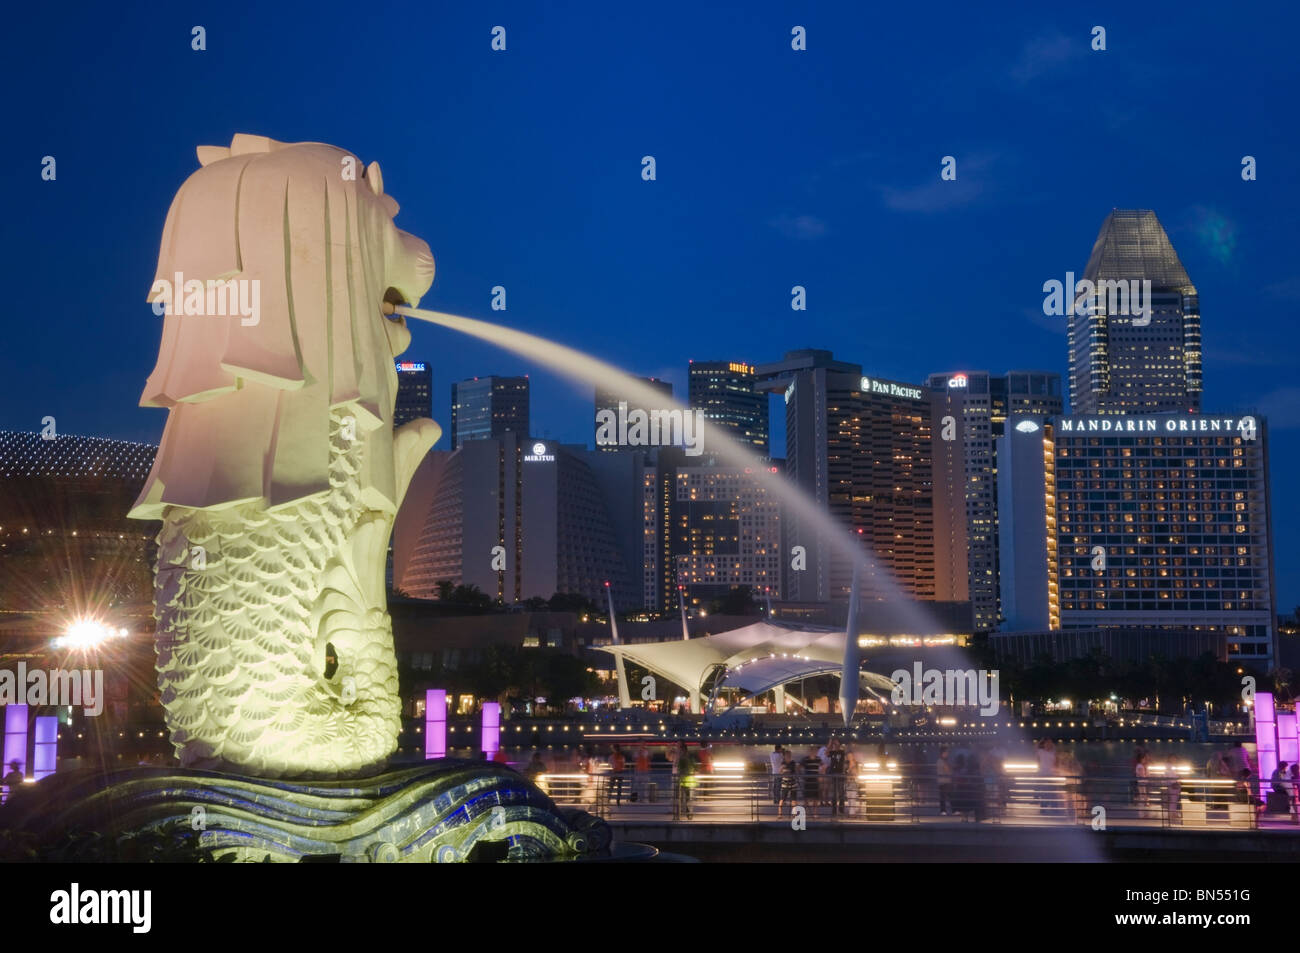 Estatua Merlion y Suntec City skyline Singapur Foto de stock